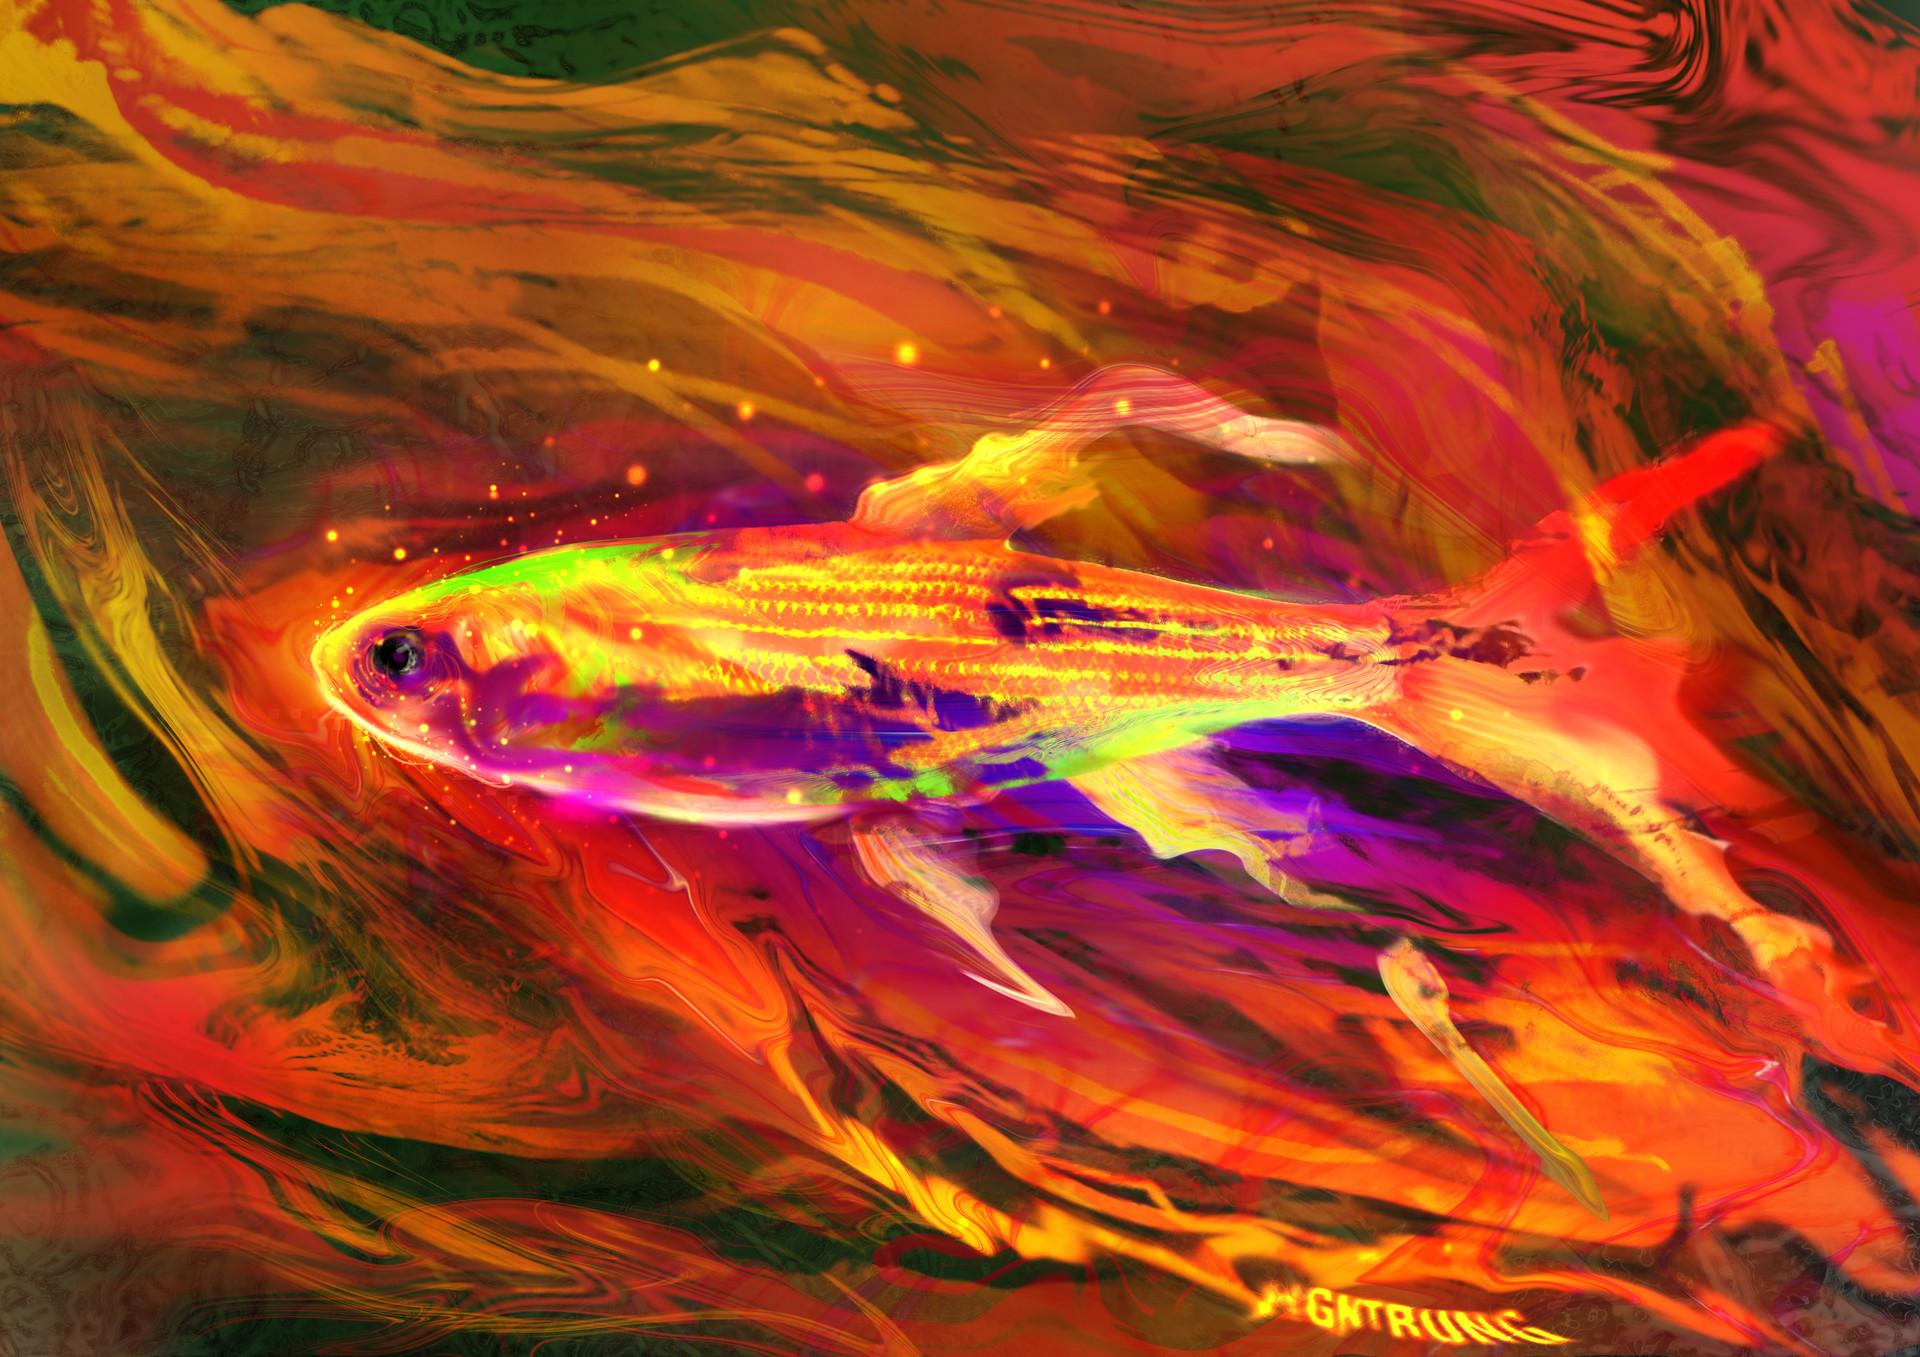 Hgntrung fish hgntrung